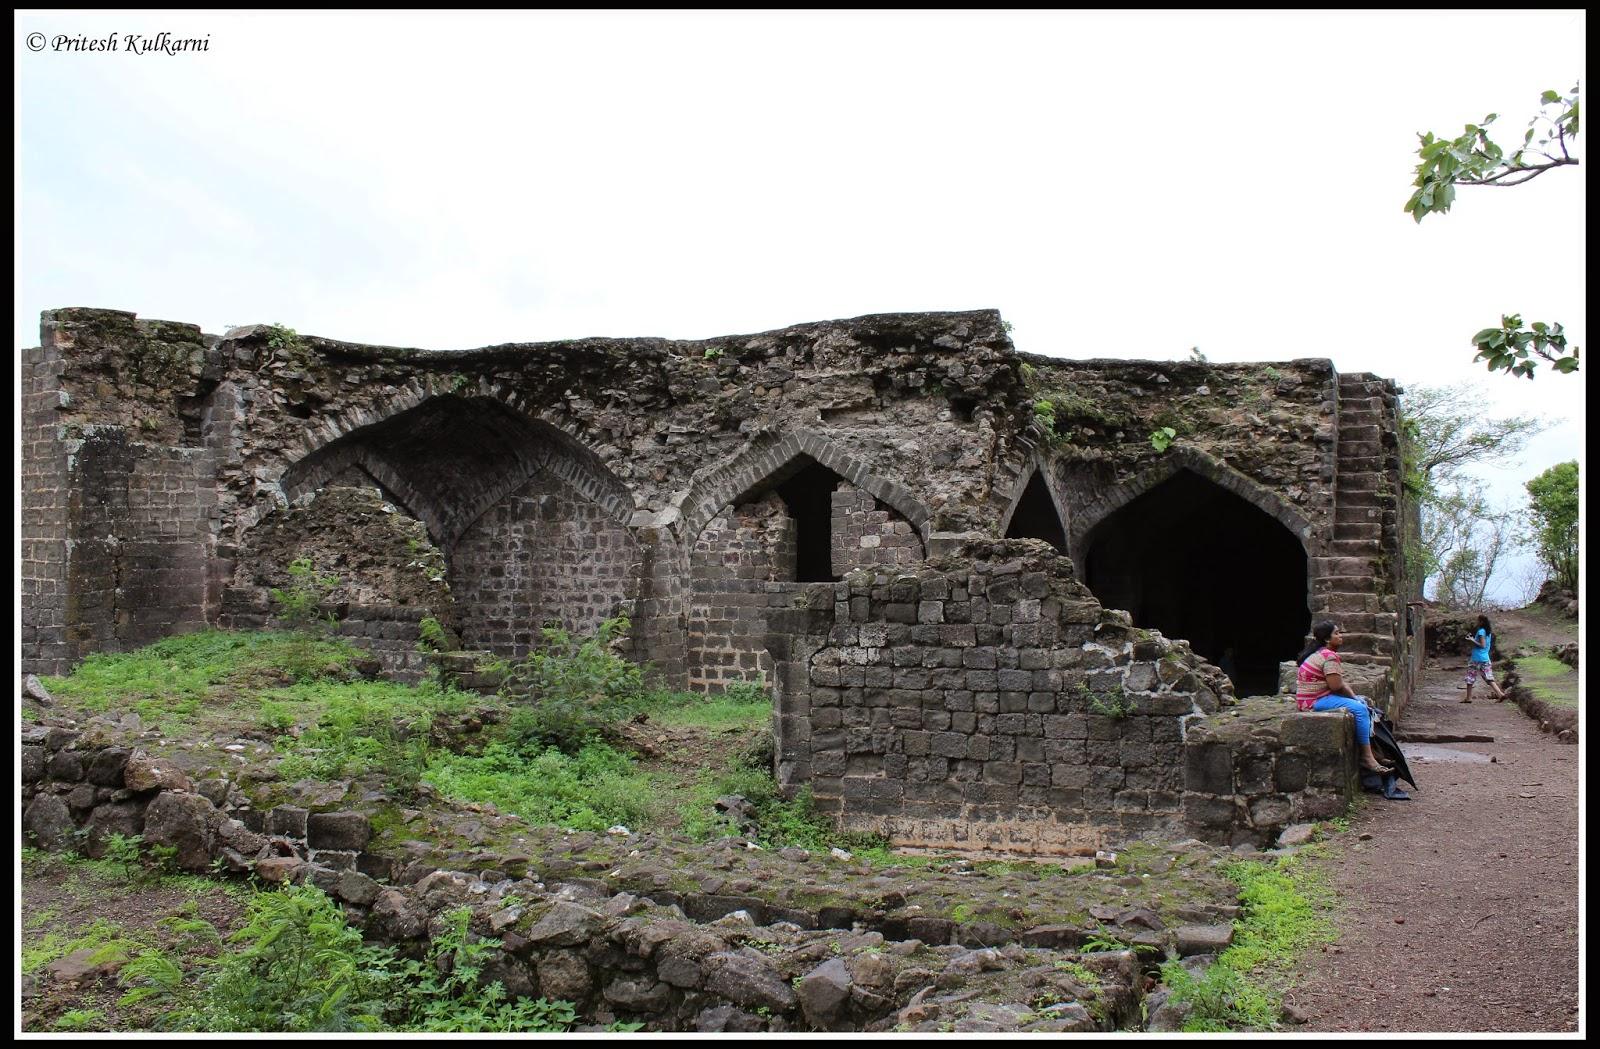 Ambarkhana, shivneri Fort